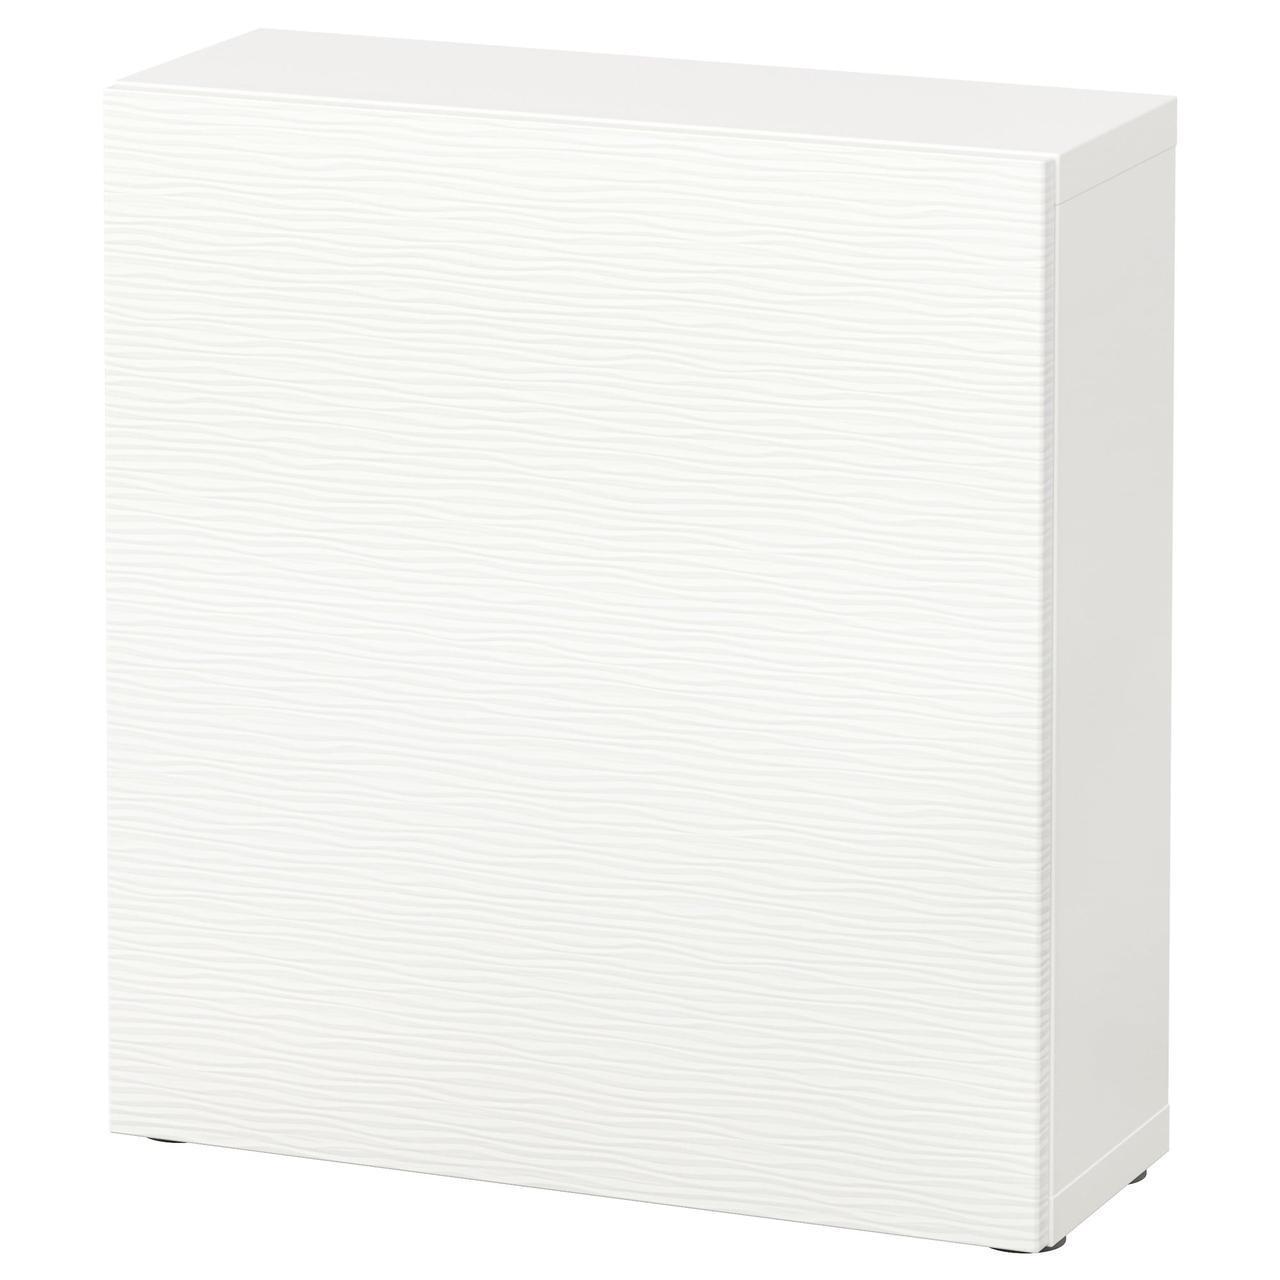 IKEA BESTA Стеллаж с дверями, Лаксвикен белый  (890.466.41)